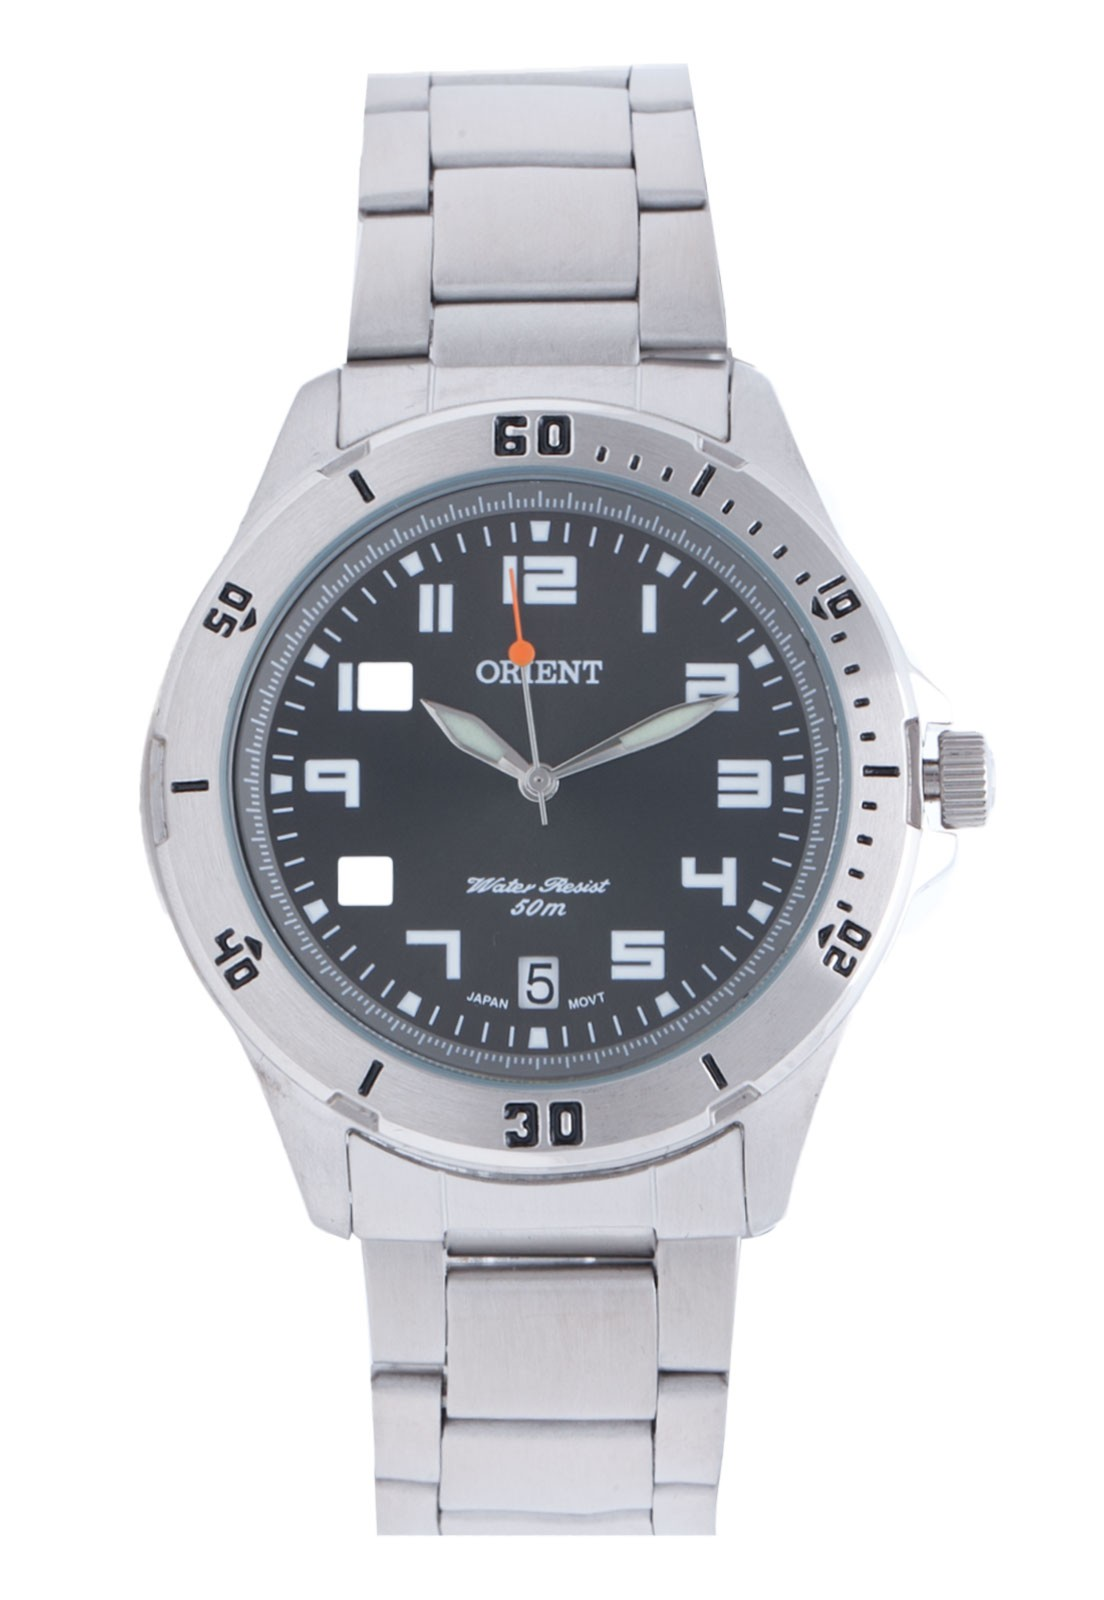 Relógio Orient Masculino - MBSS1155A G2SX  - Dumont Online - Joias e Relógios